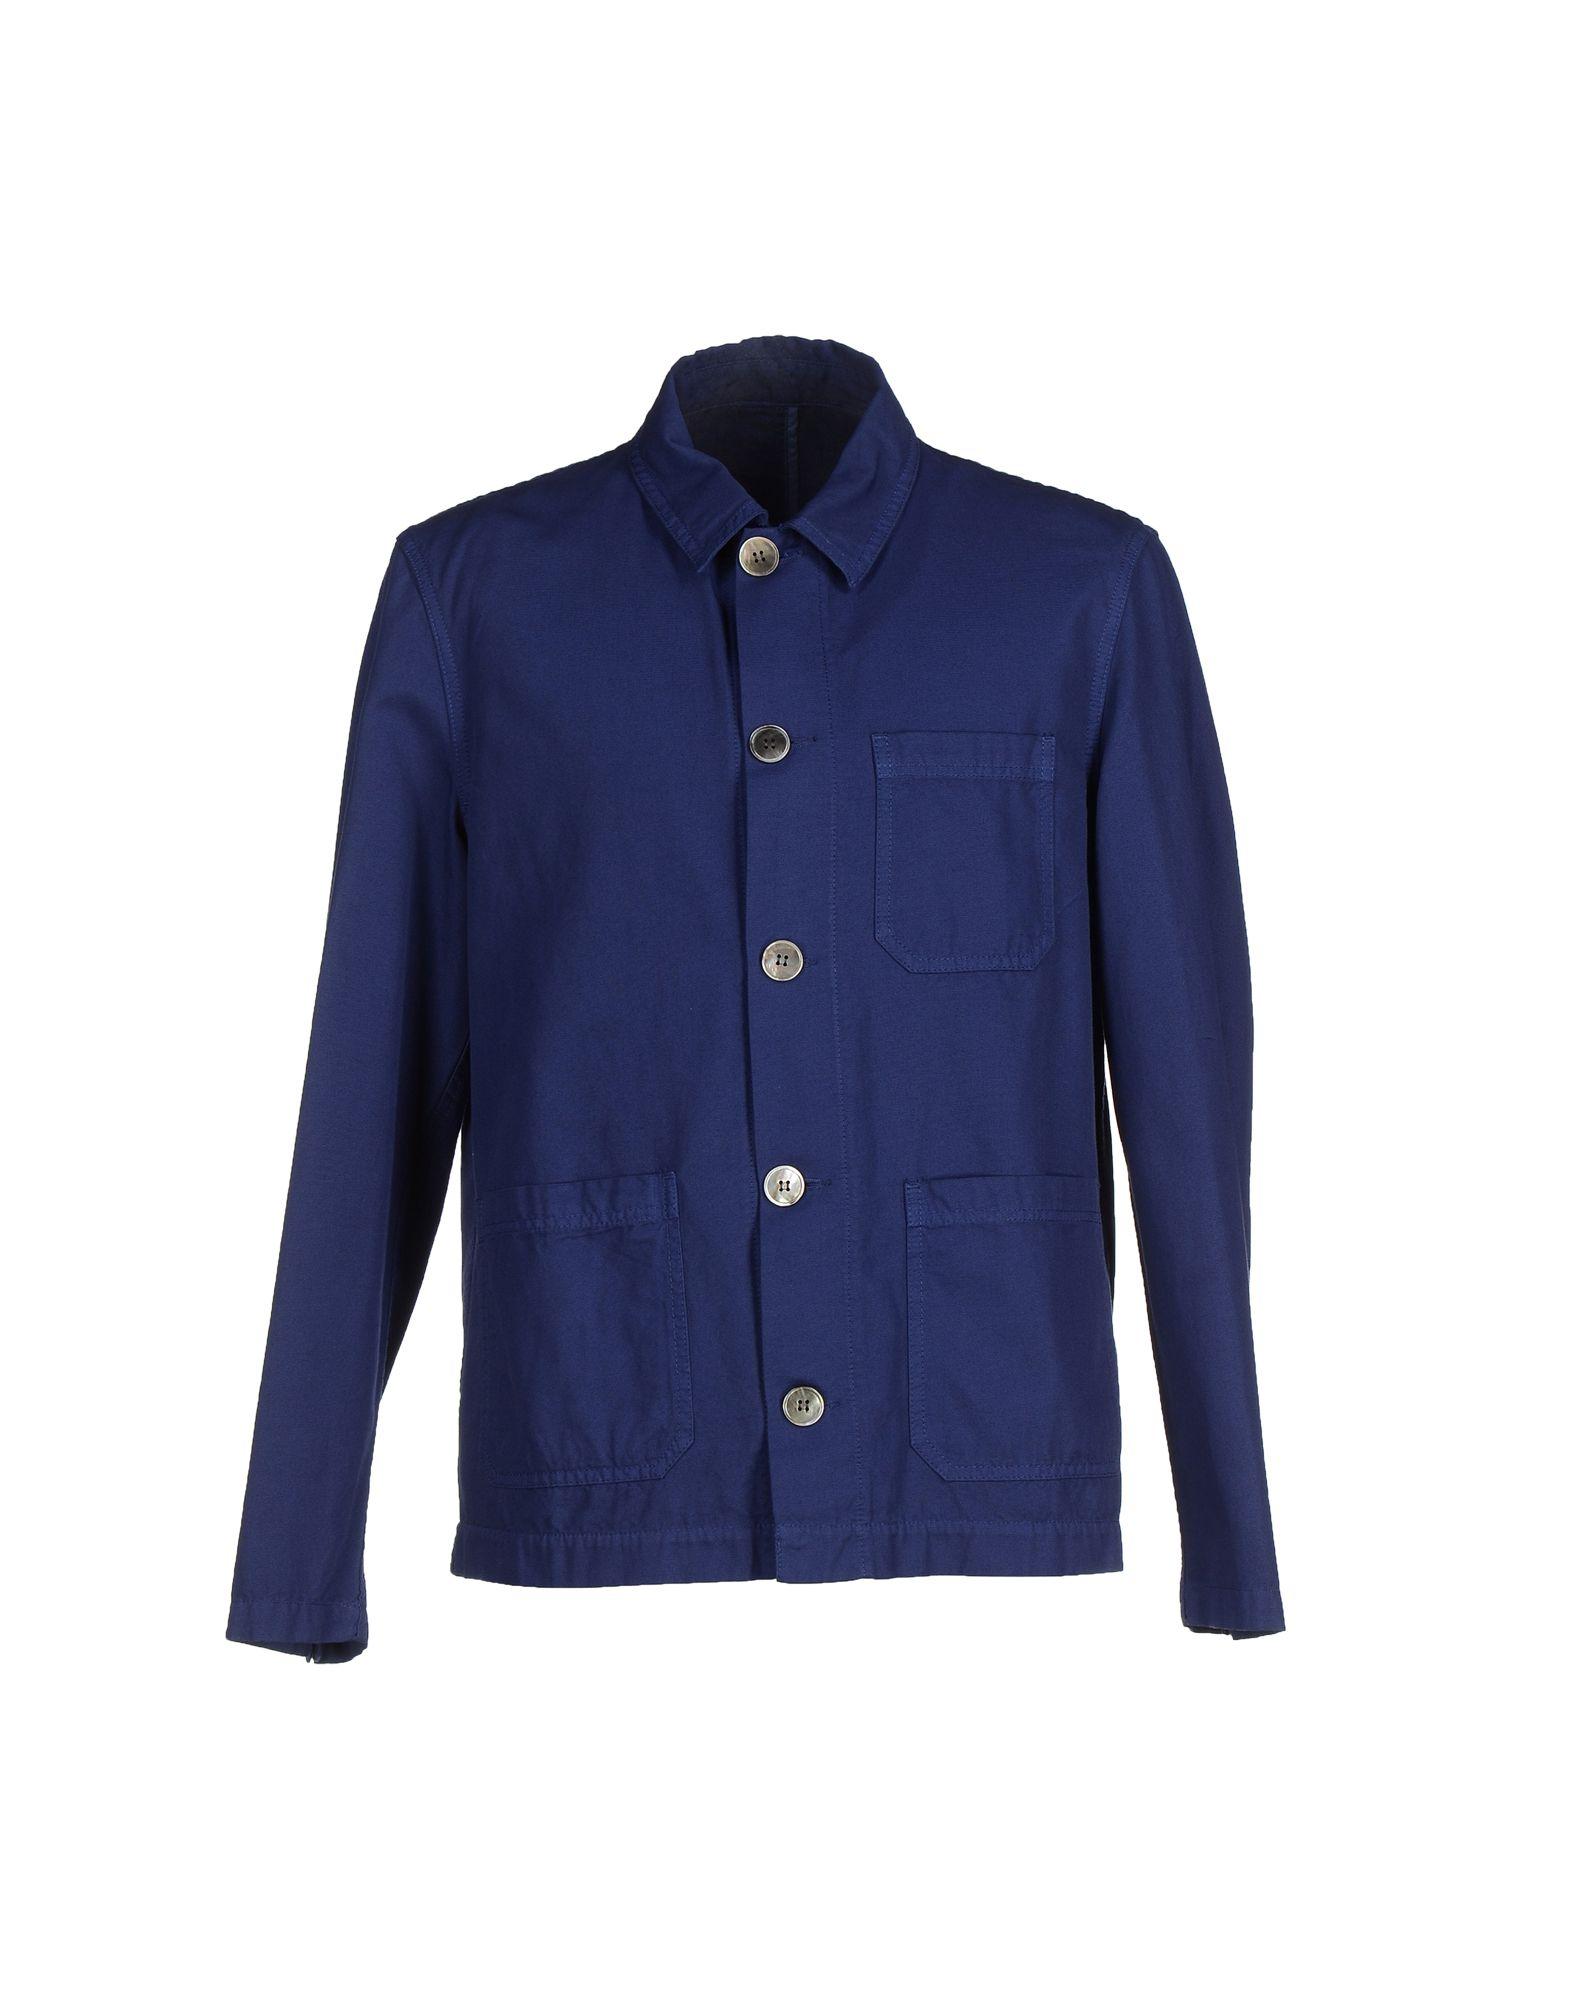 hardy amies повседневные брюки HARDY AMIES Куртка